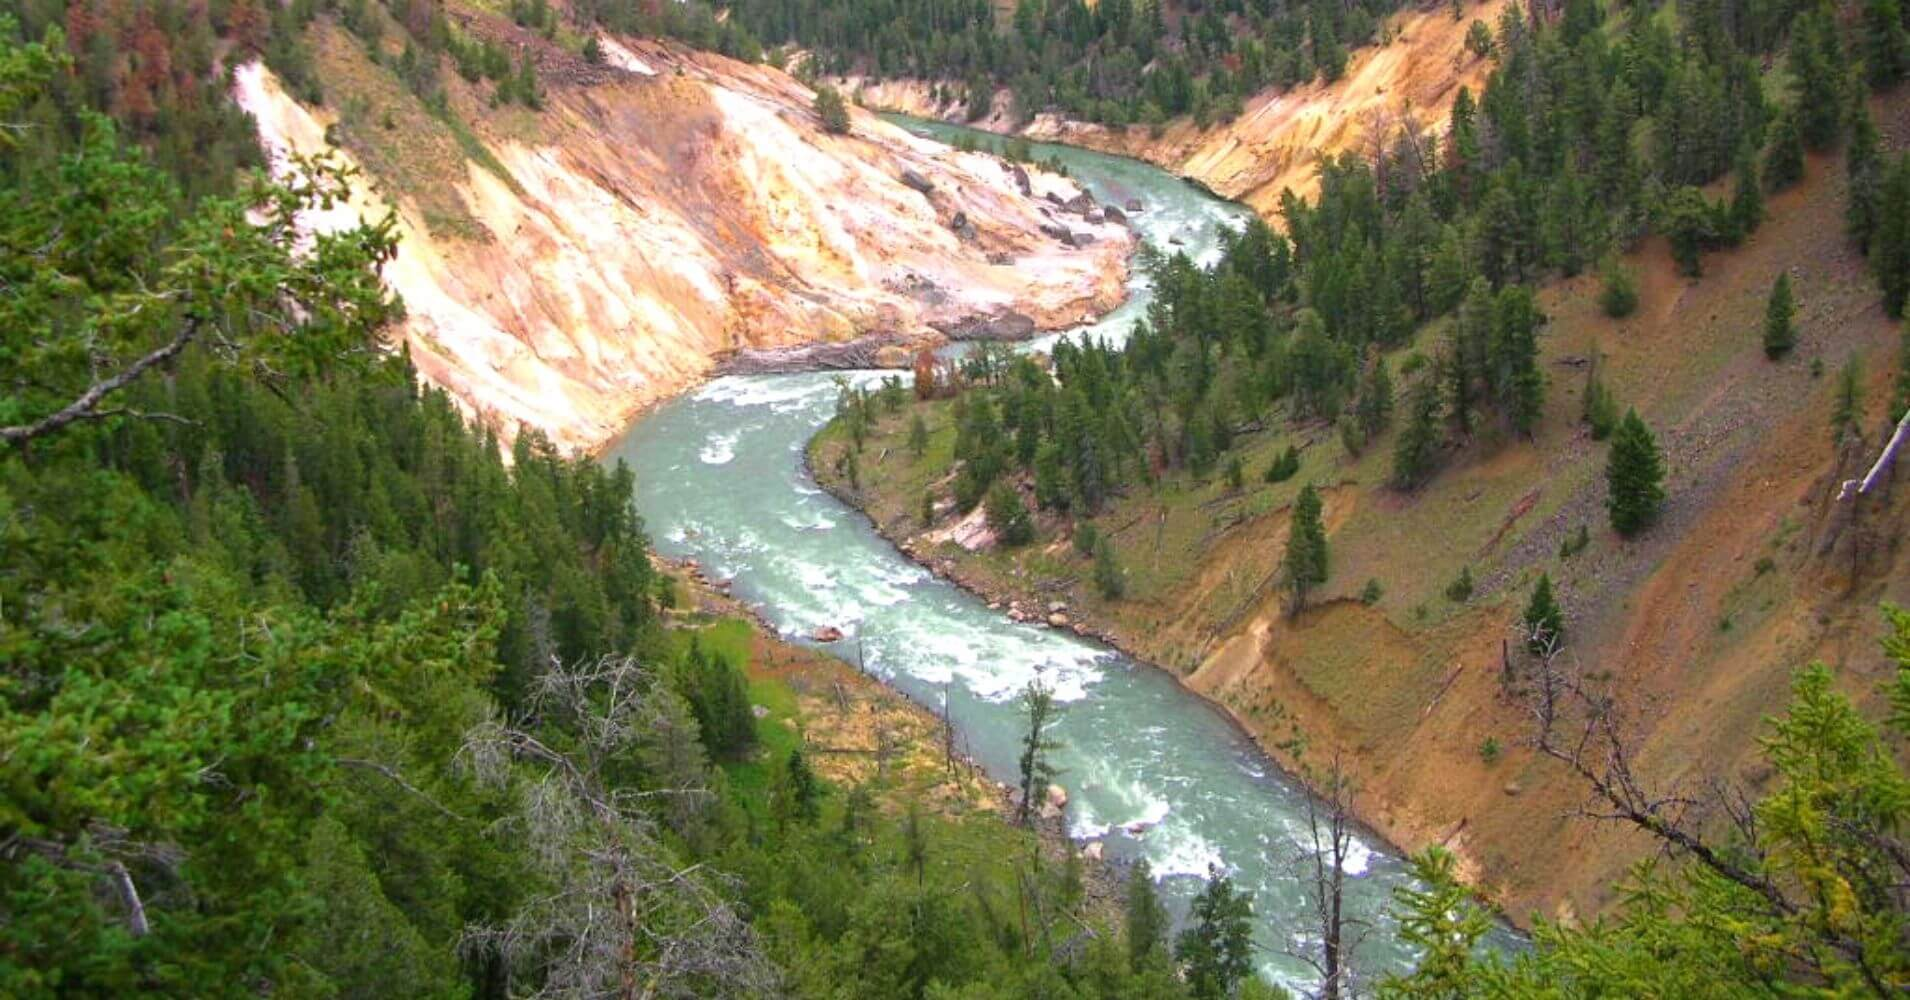 Cañón del Rio Yellowstone. Wyoming, Estados Unidos.